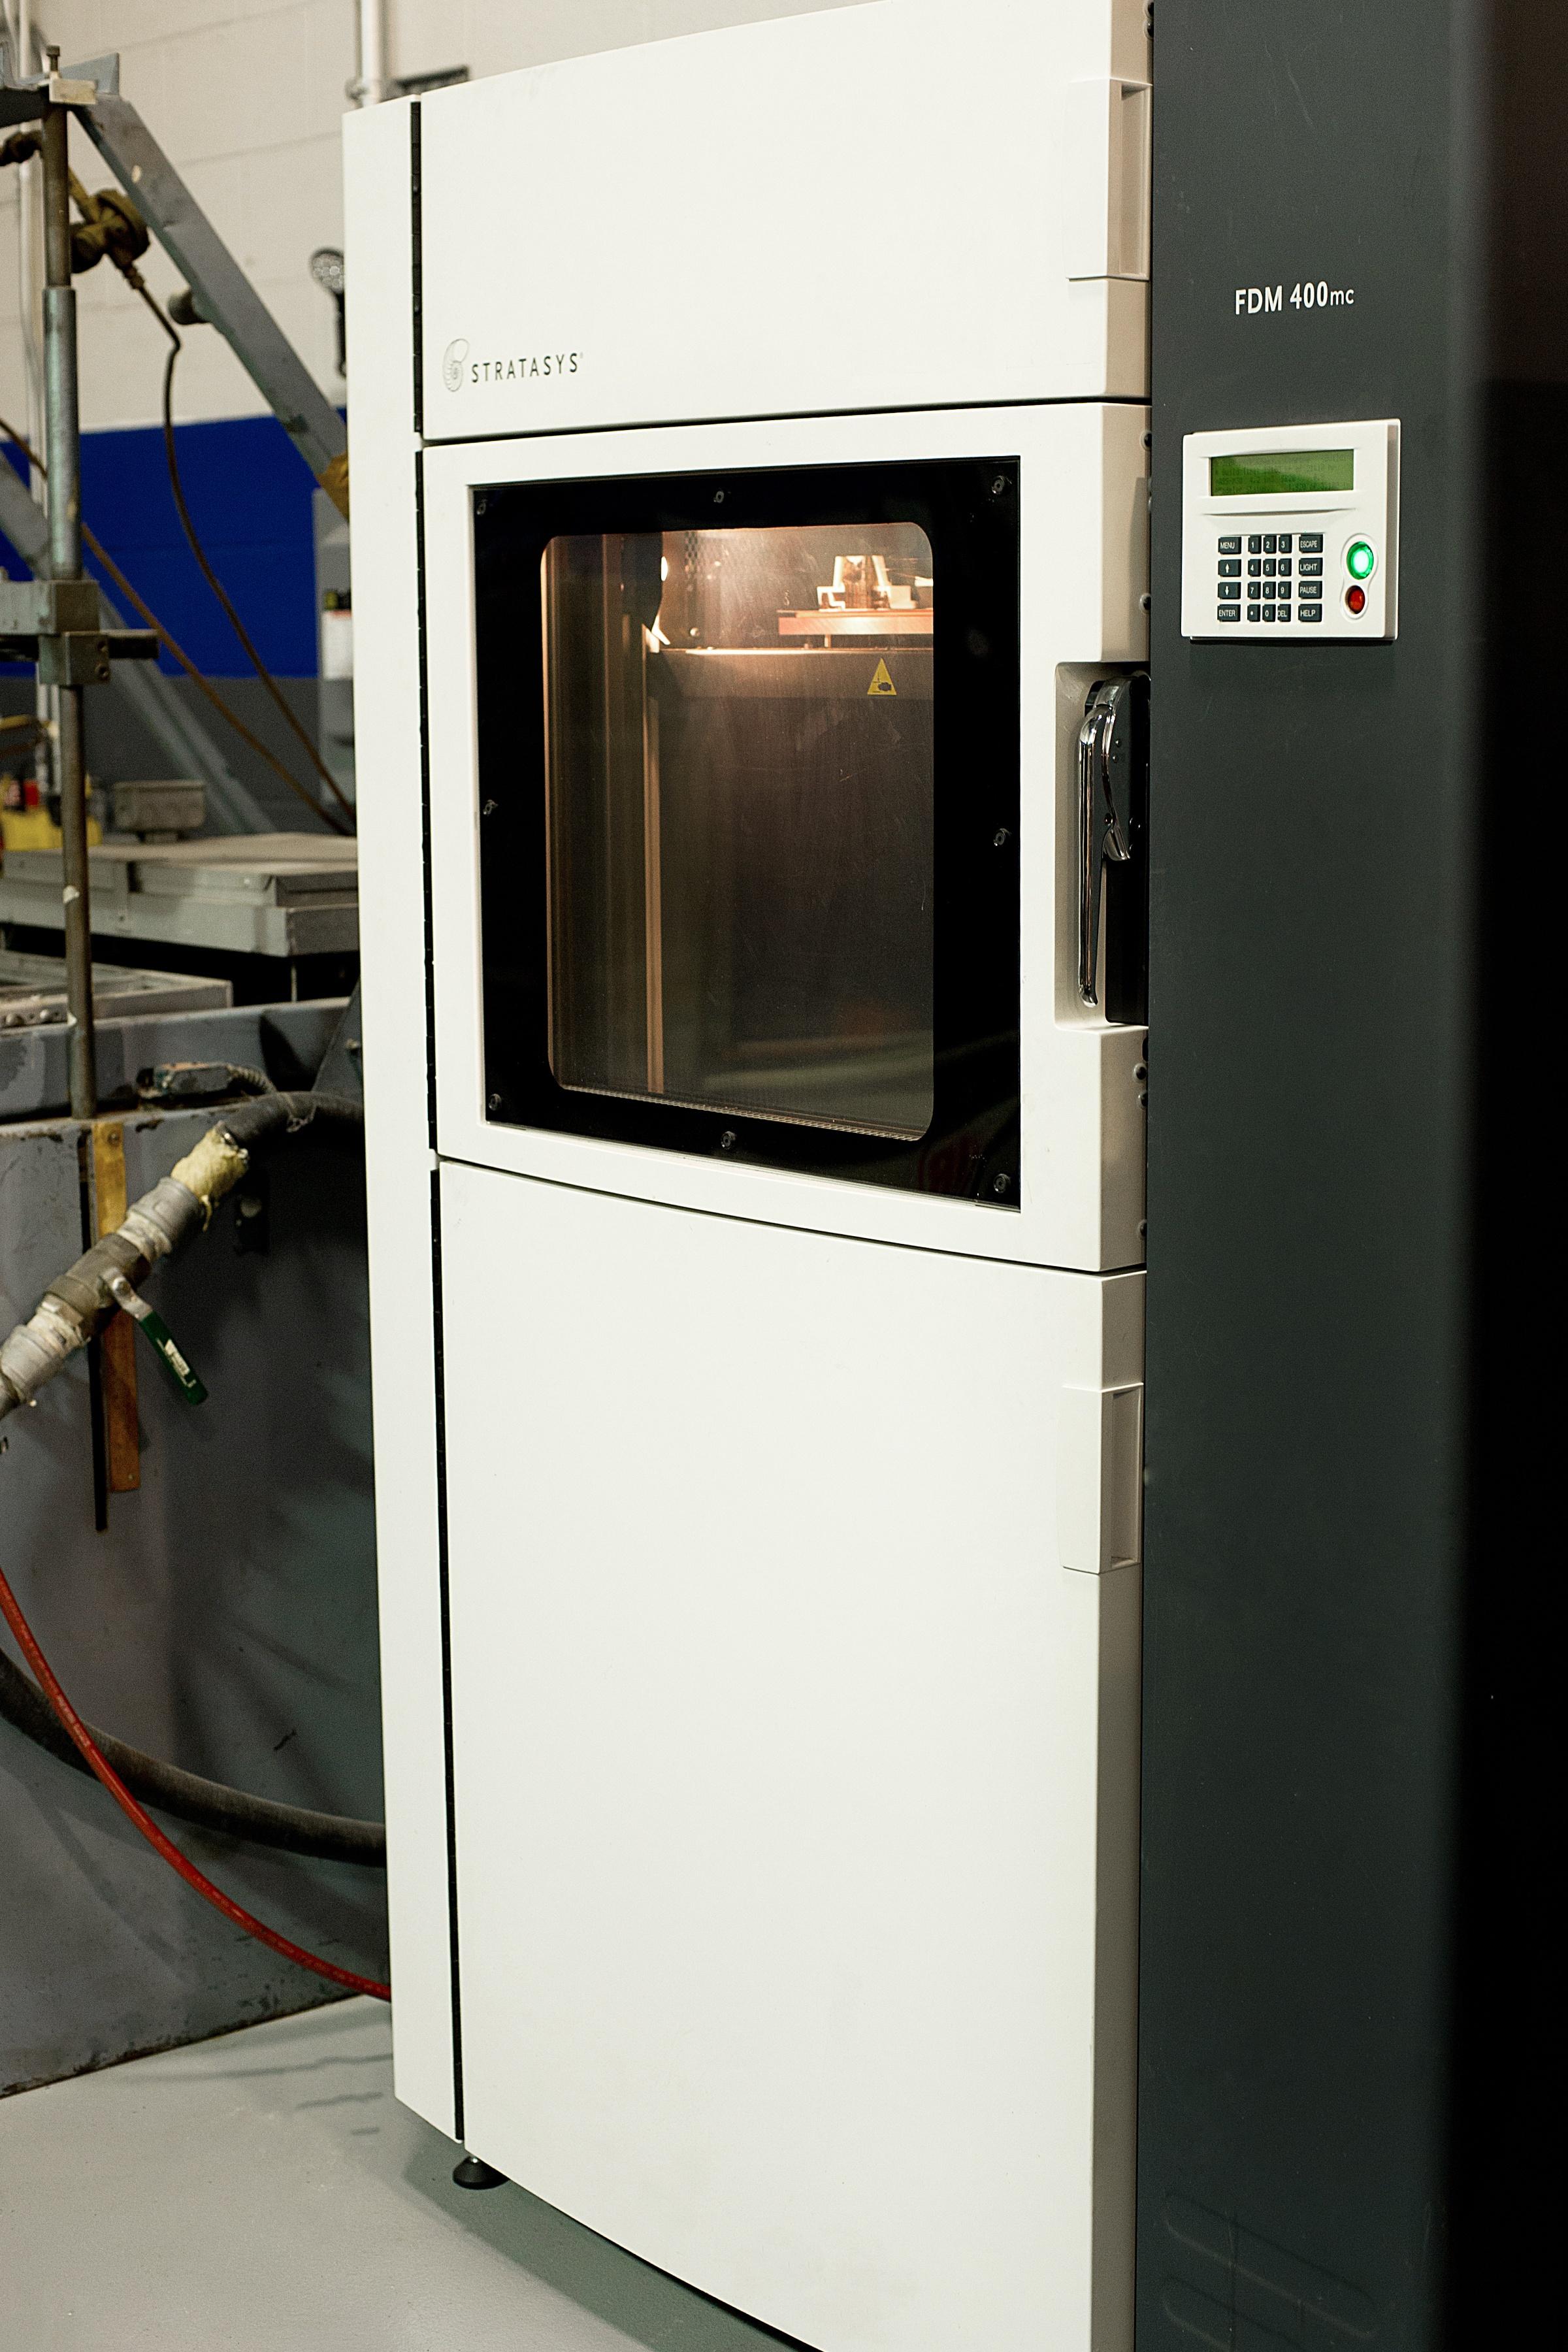 Stratasys 3D Printer - FDM 400mc